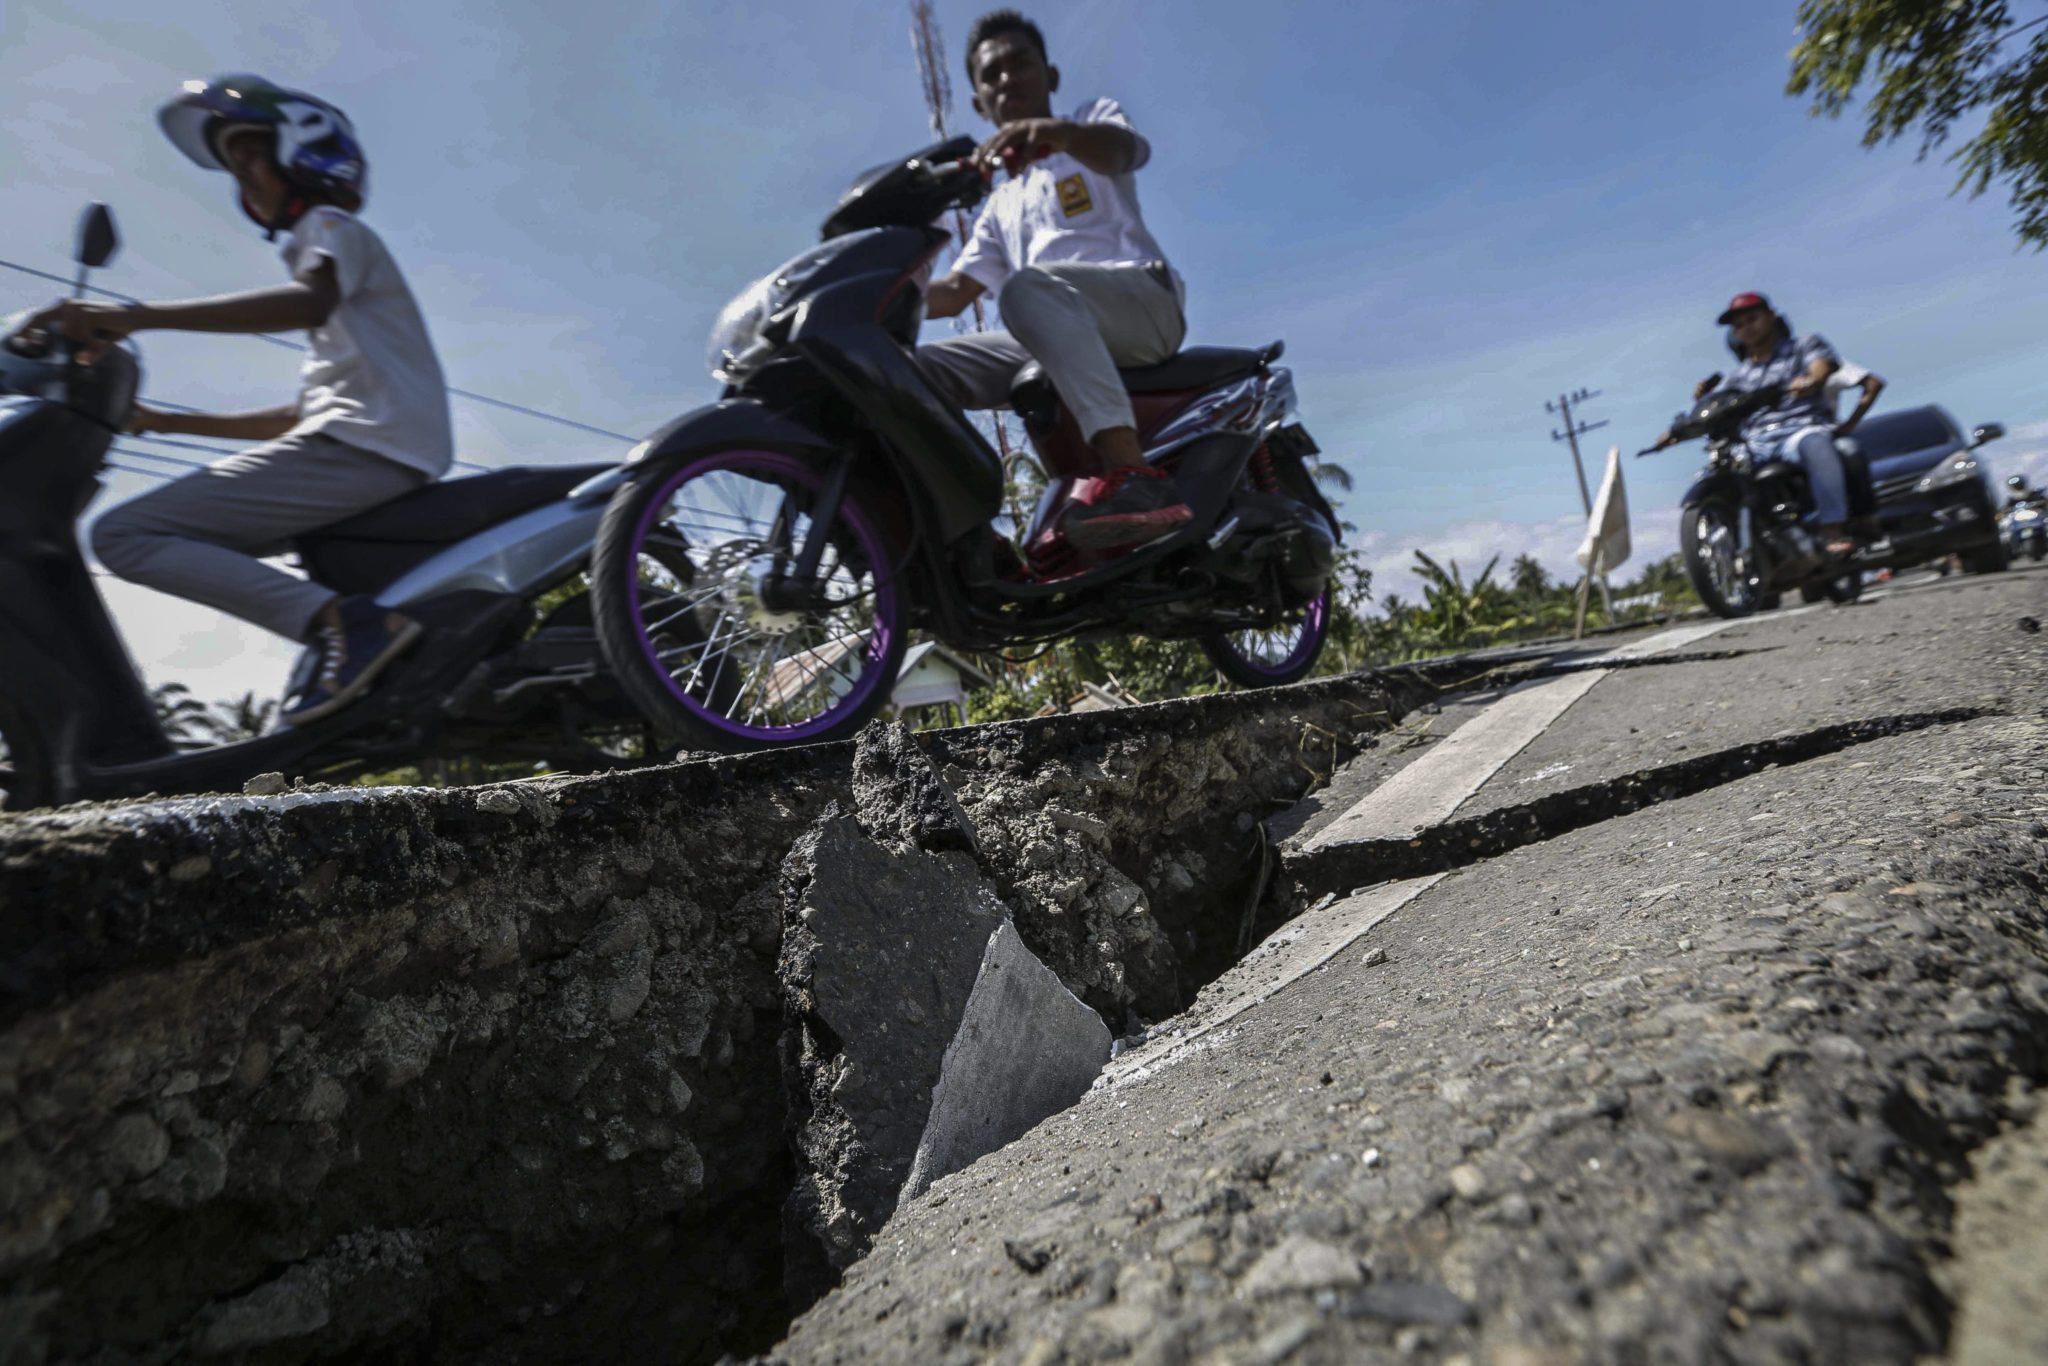 Indonezja: skutki trzęsienia ziemi w Aceh (foto. PAP/EPA/HOTLI SIMANJUNTAK)